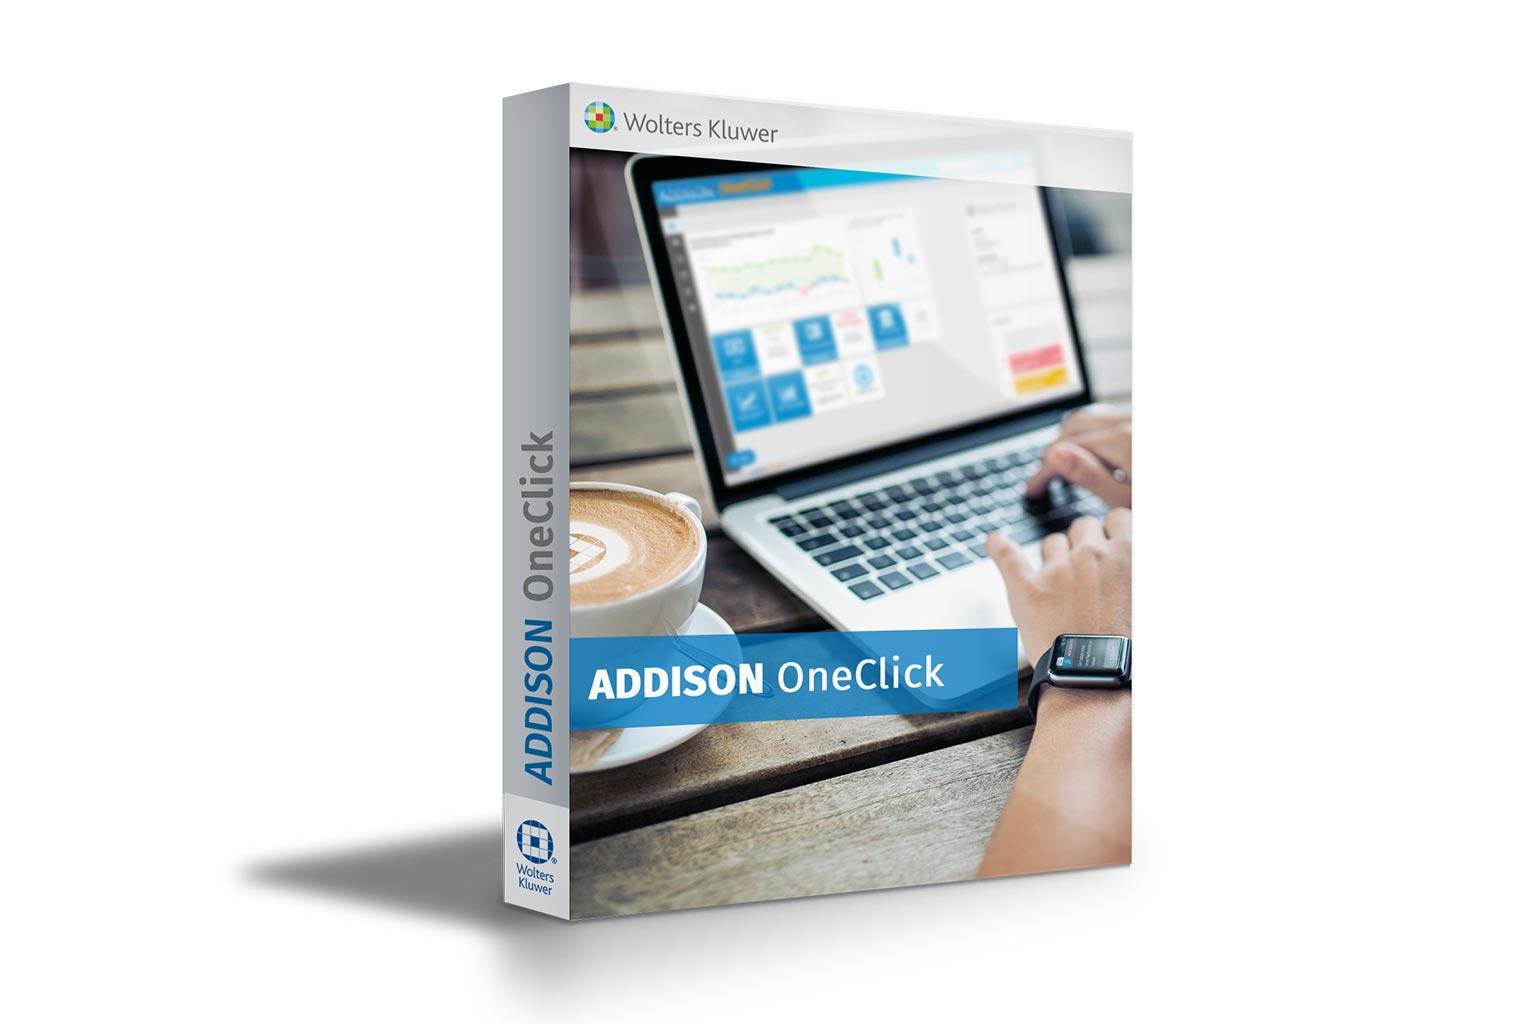 Addison OneClick